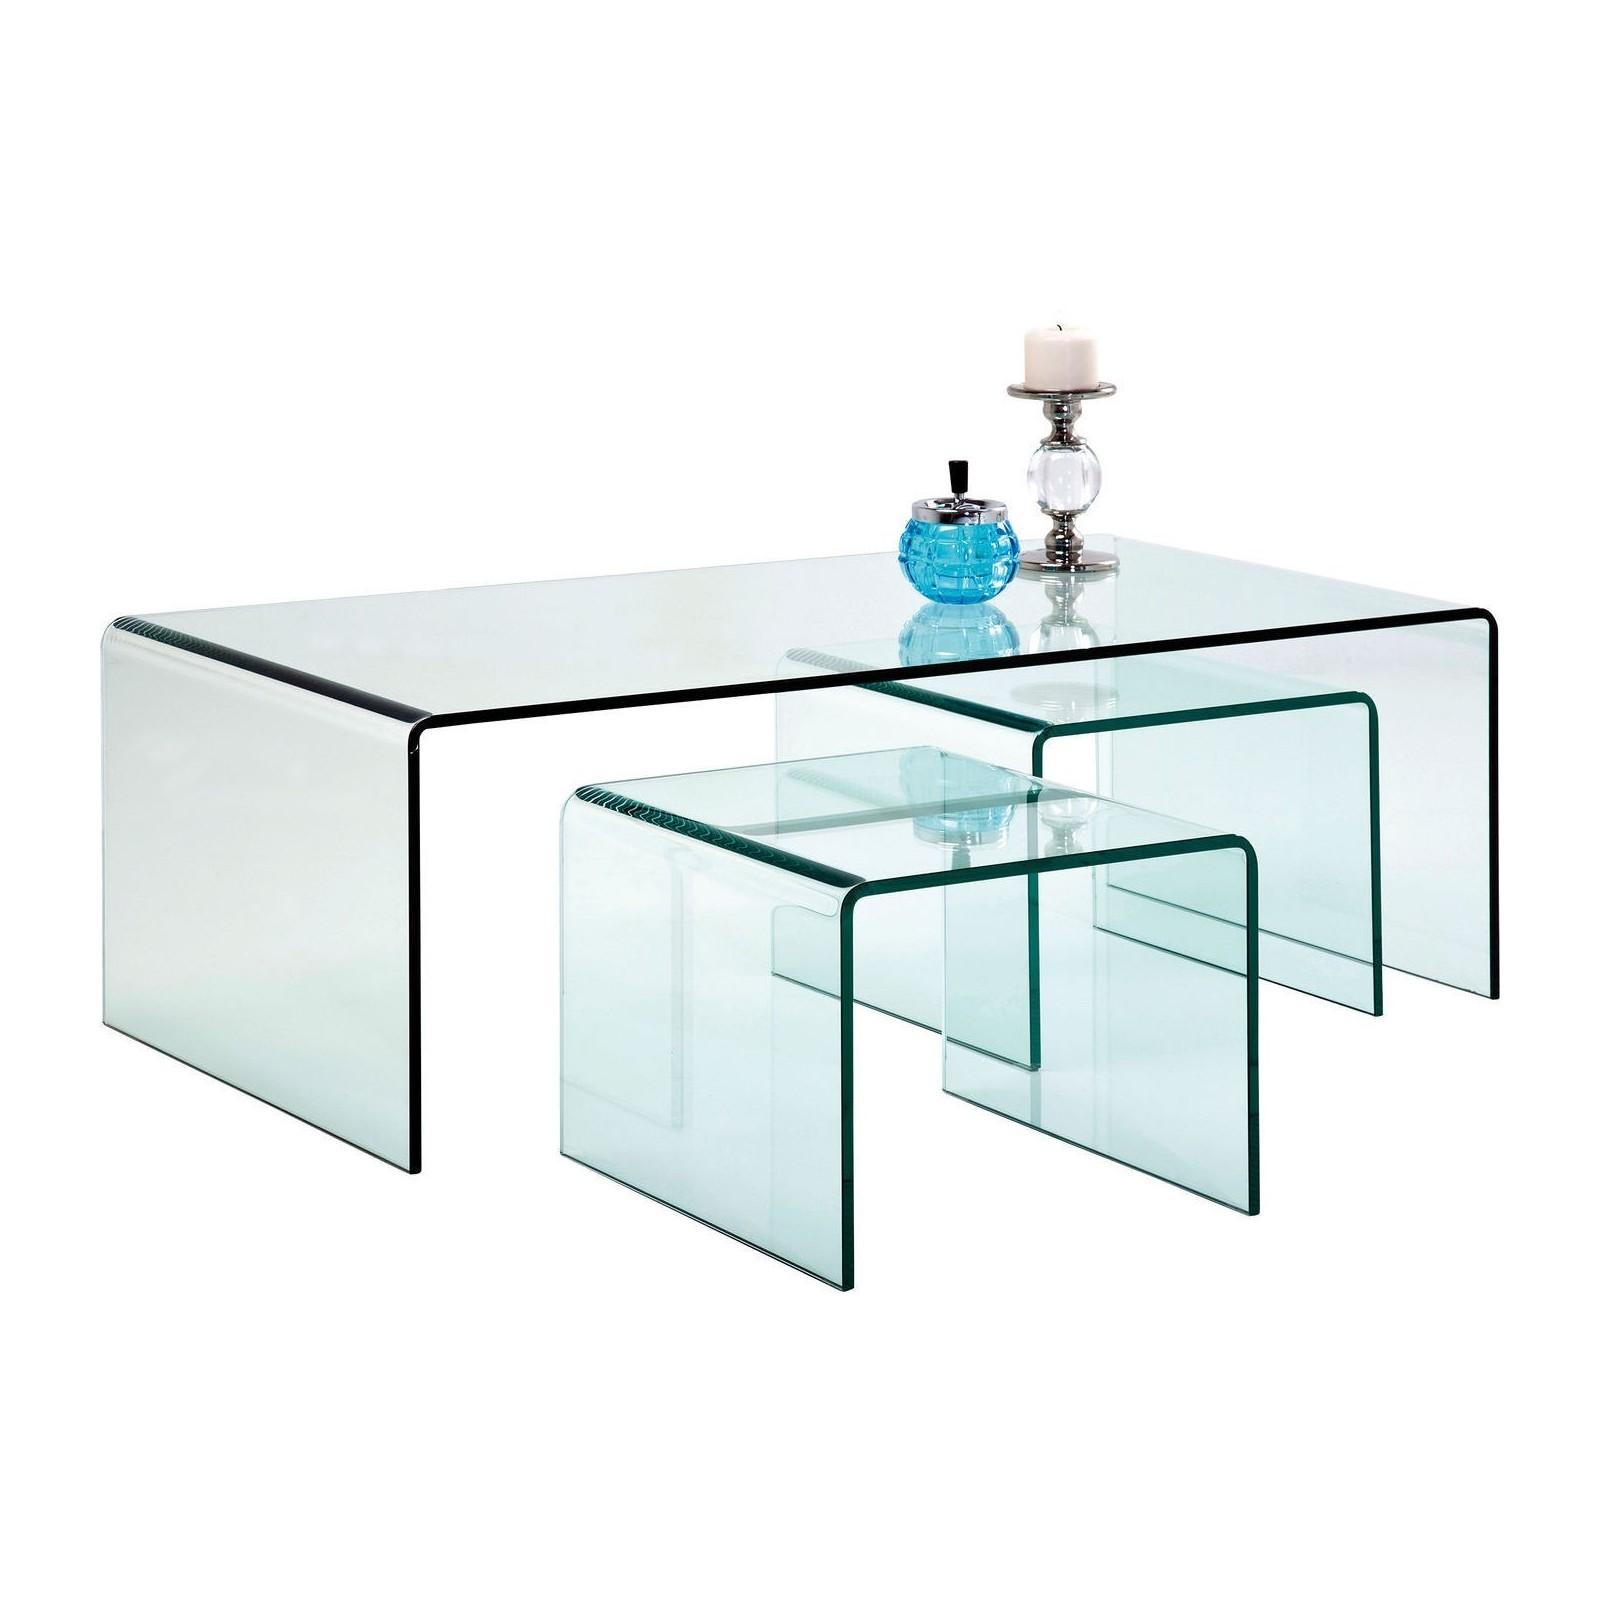 TABLES BASSES TRANSPARENTES CLEAR CLUB SET DE 3 KARE DESIGN